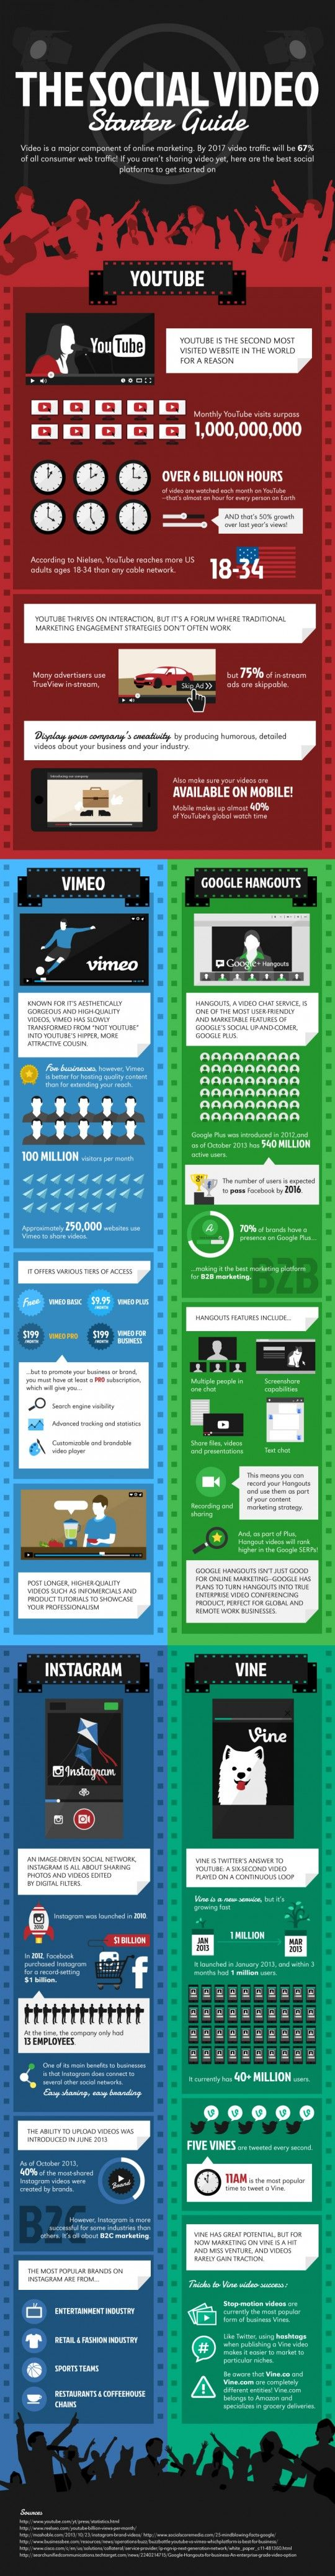 The Social Video Starter Guide #socialmedia